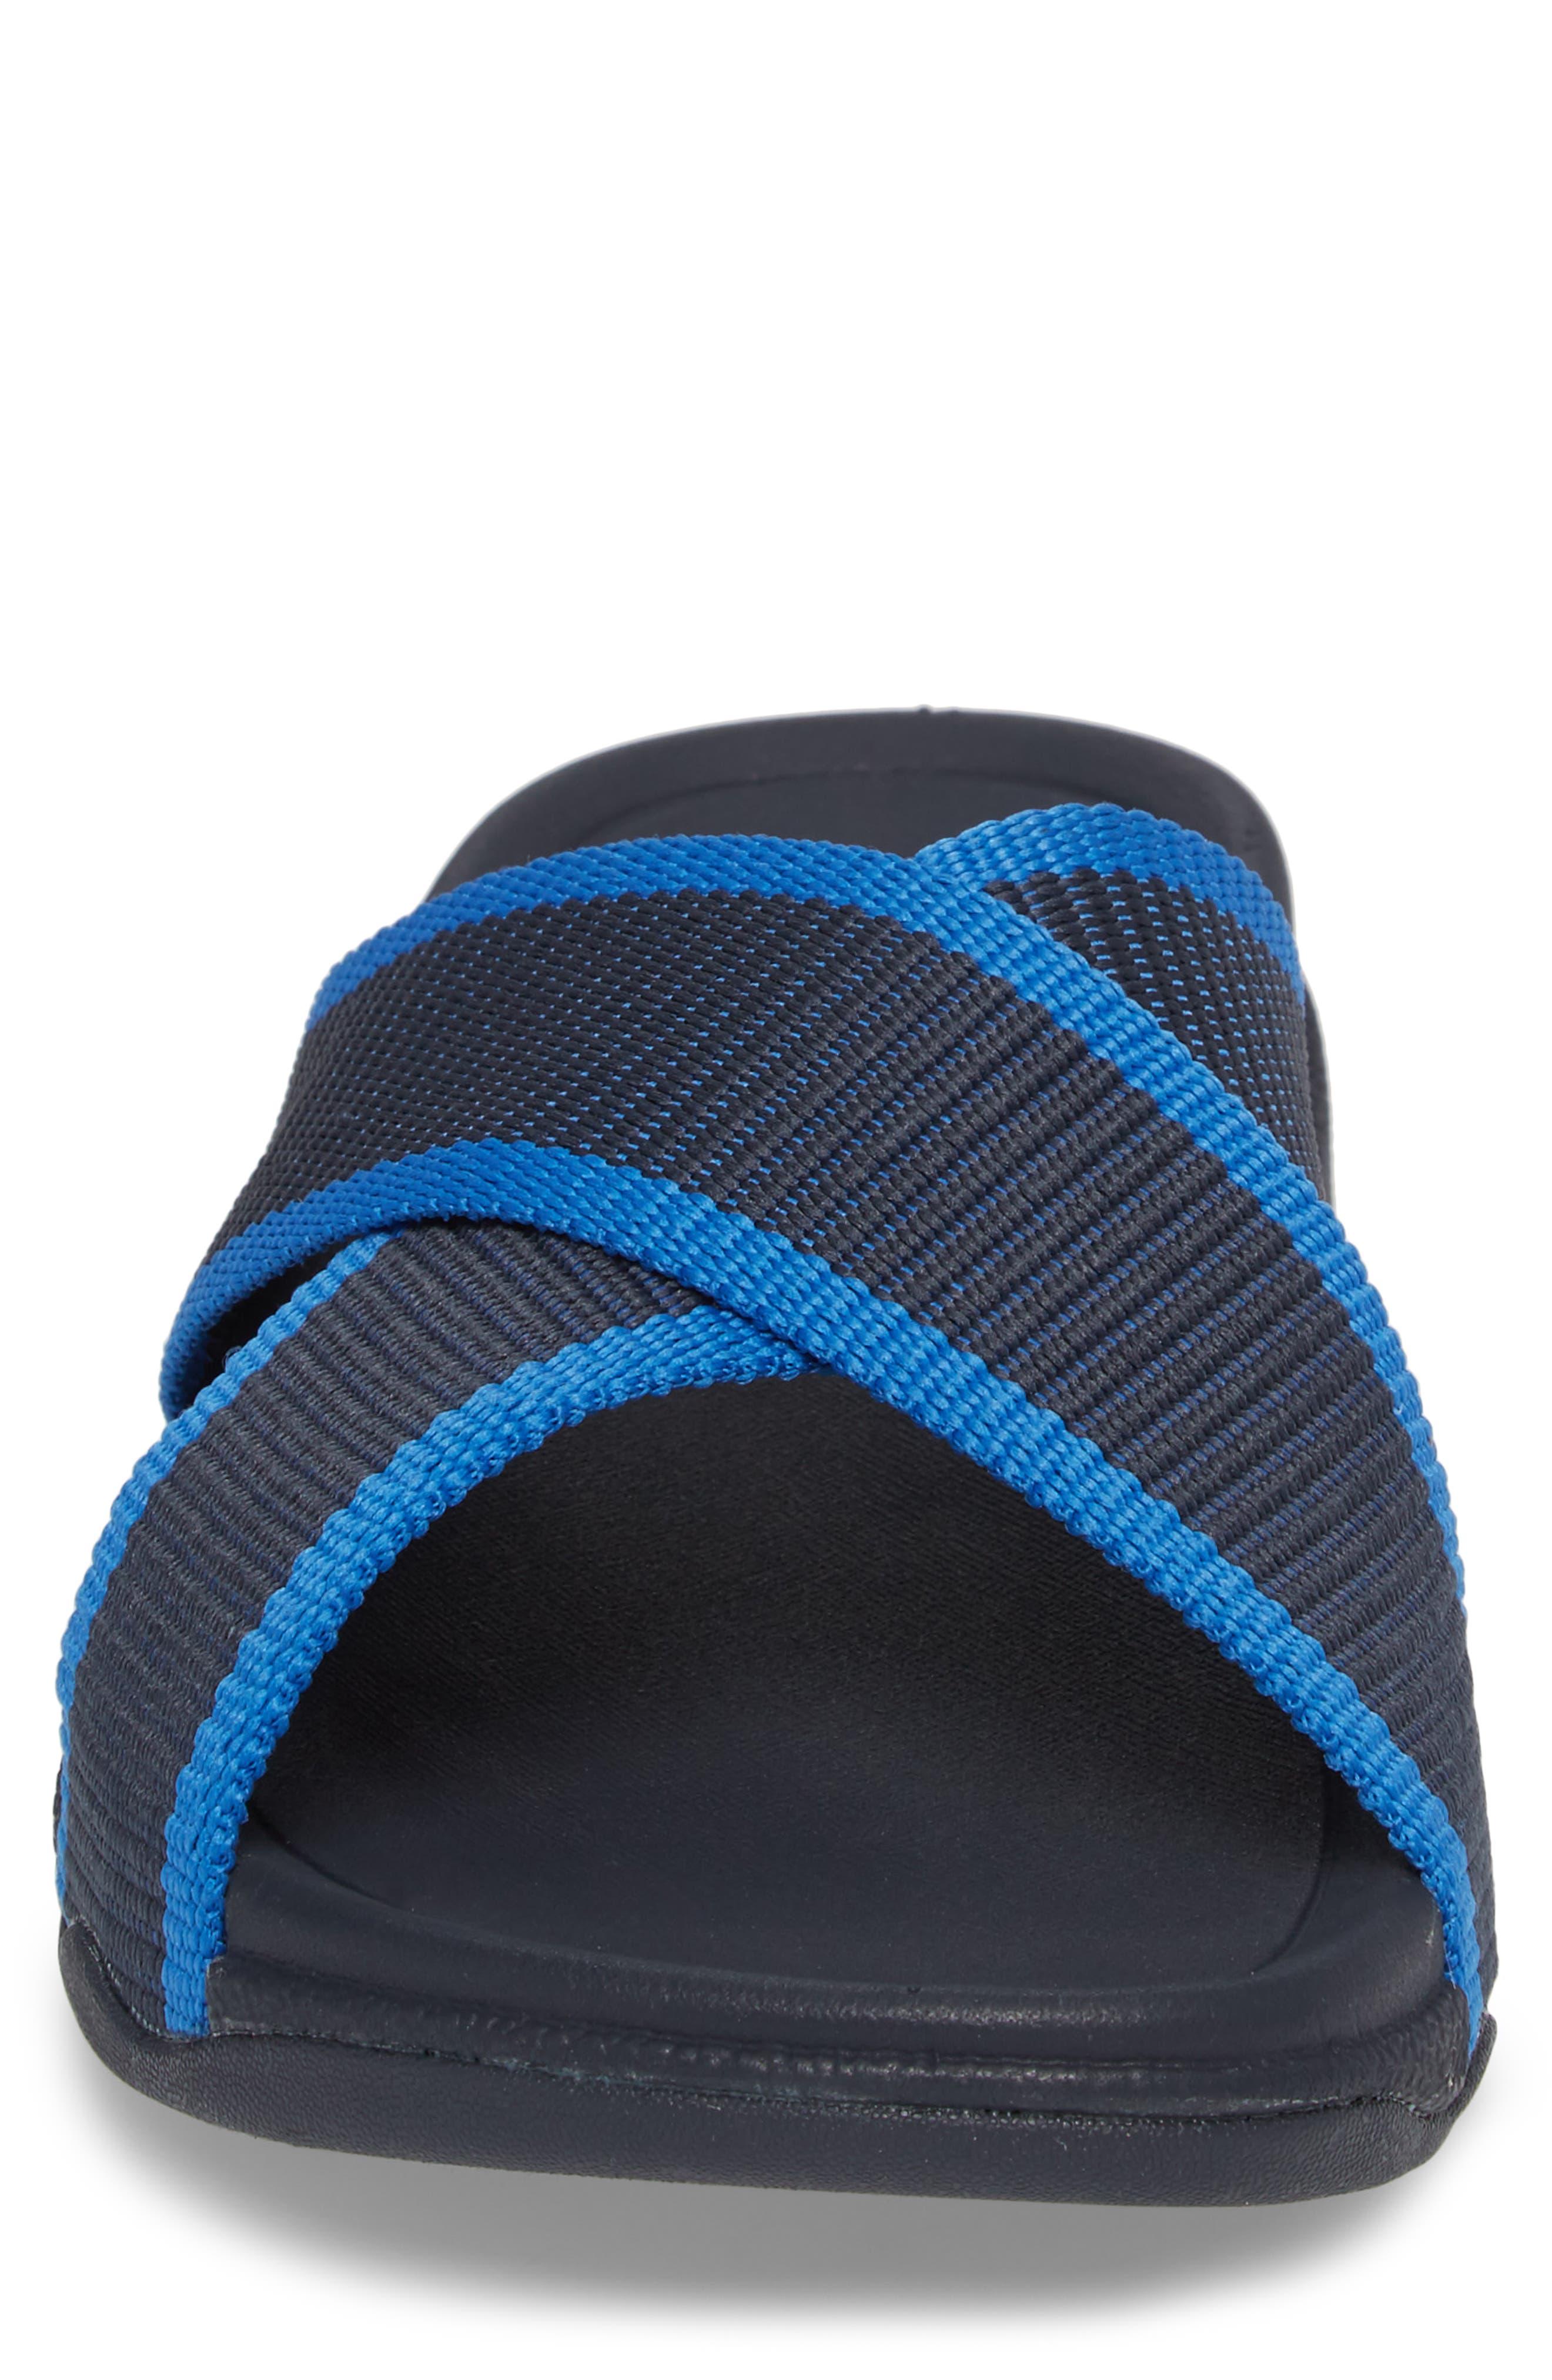 Surfer Slide Sandal,                             Alternate thumbnail 4, color,                             SUPERNAVY BLUE